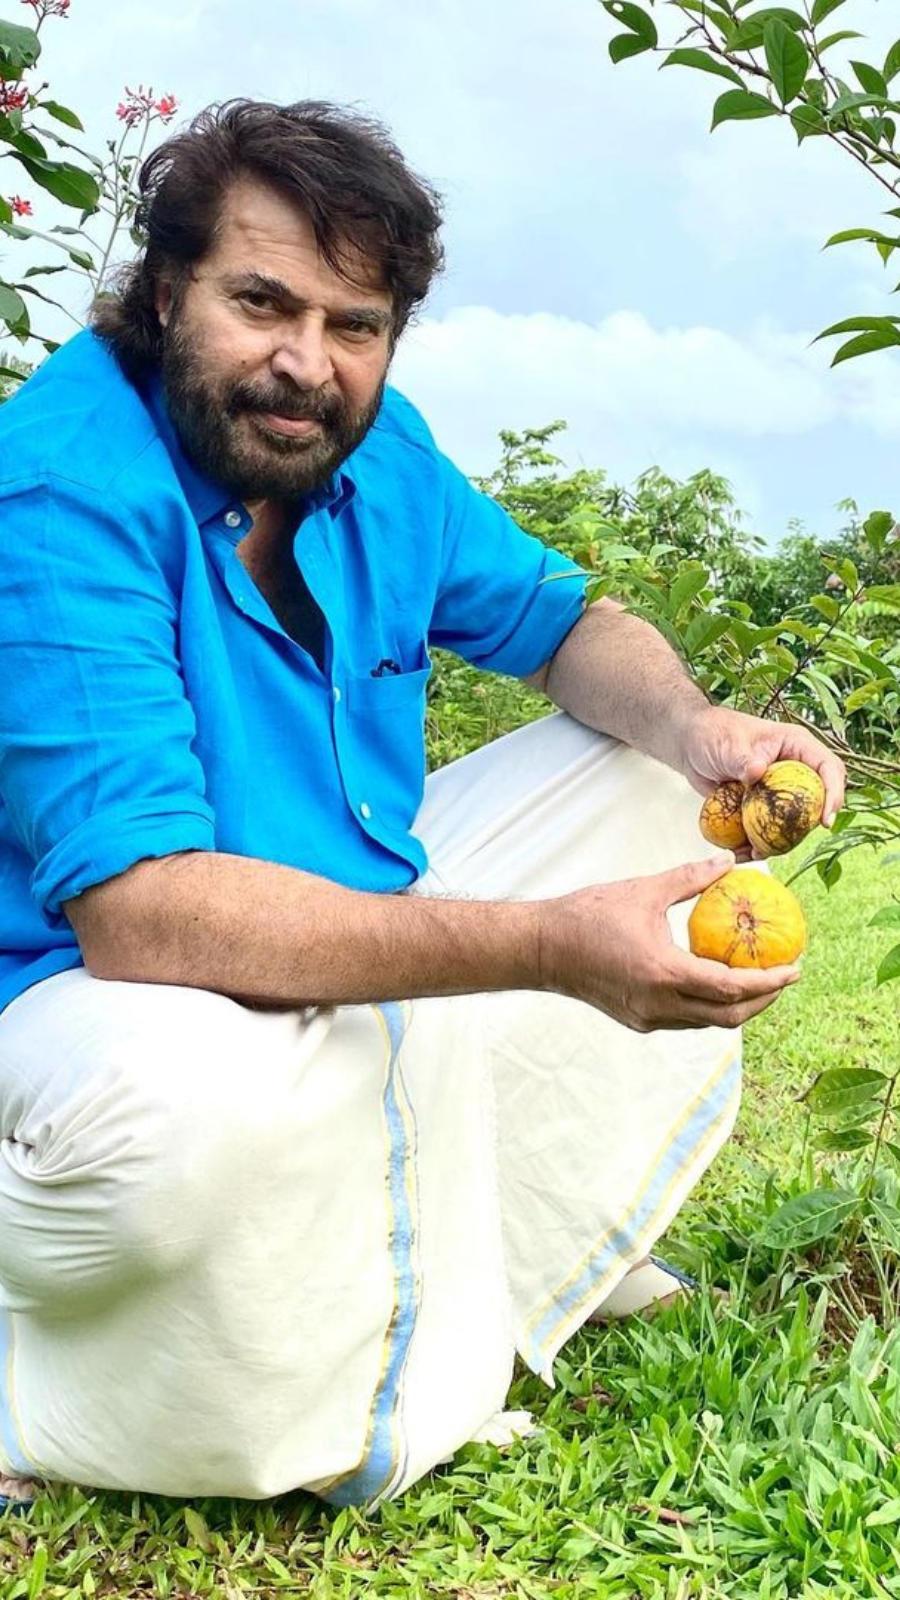 'Fruit'ful backyard